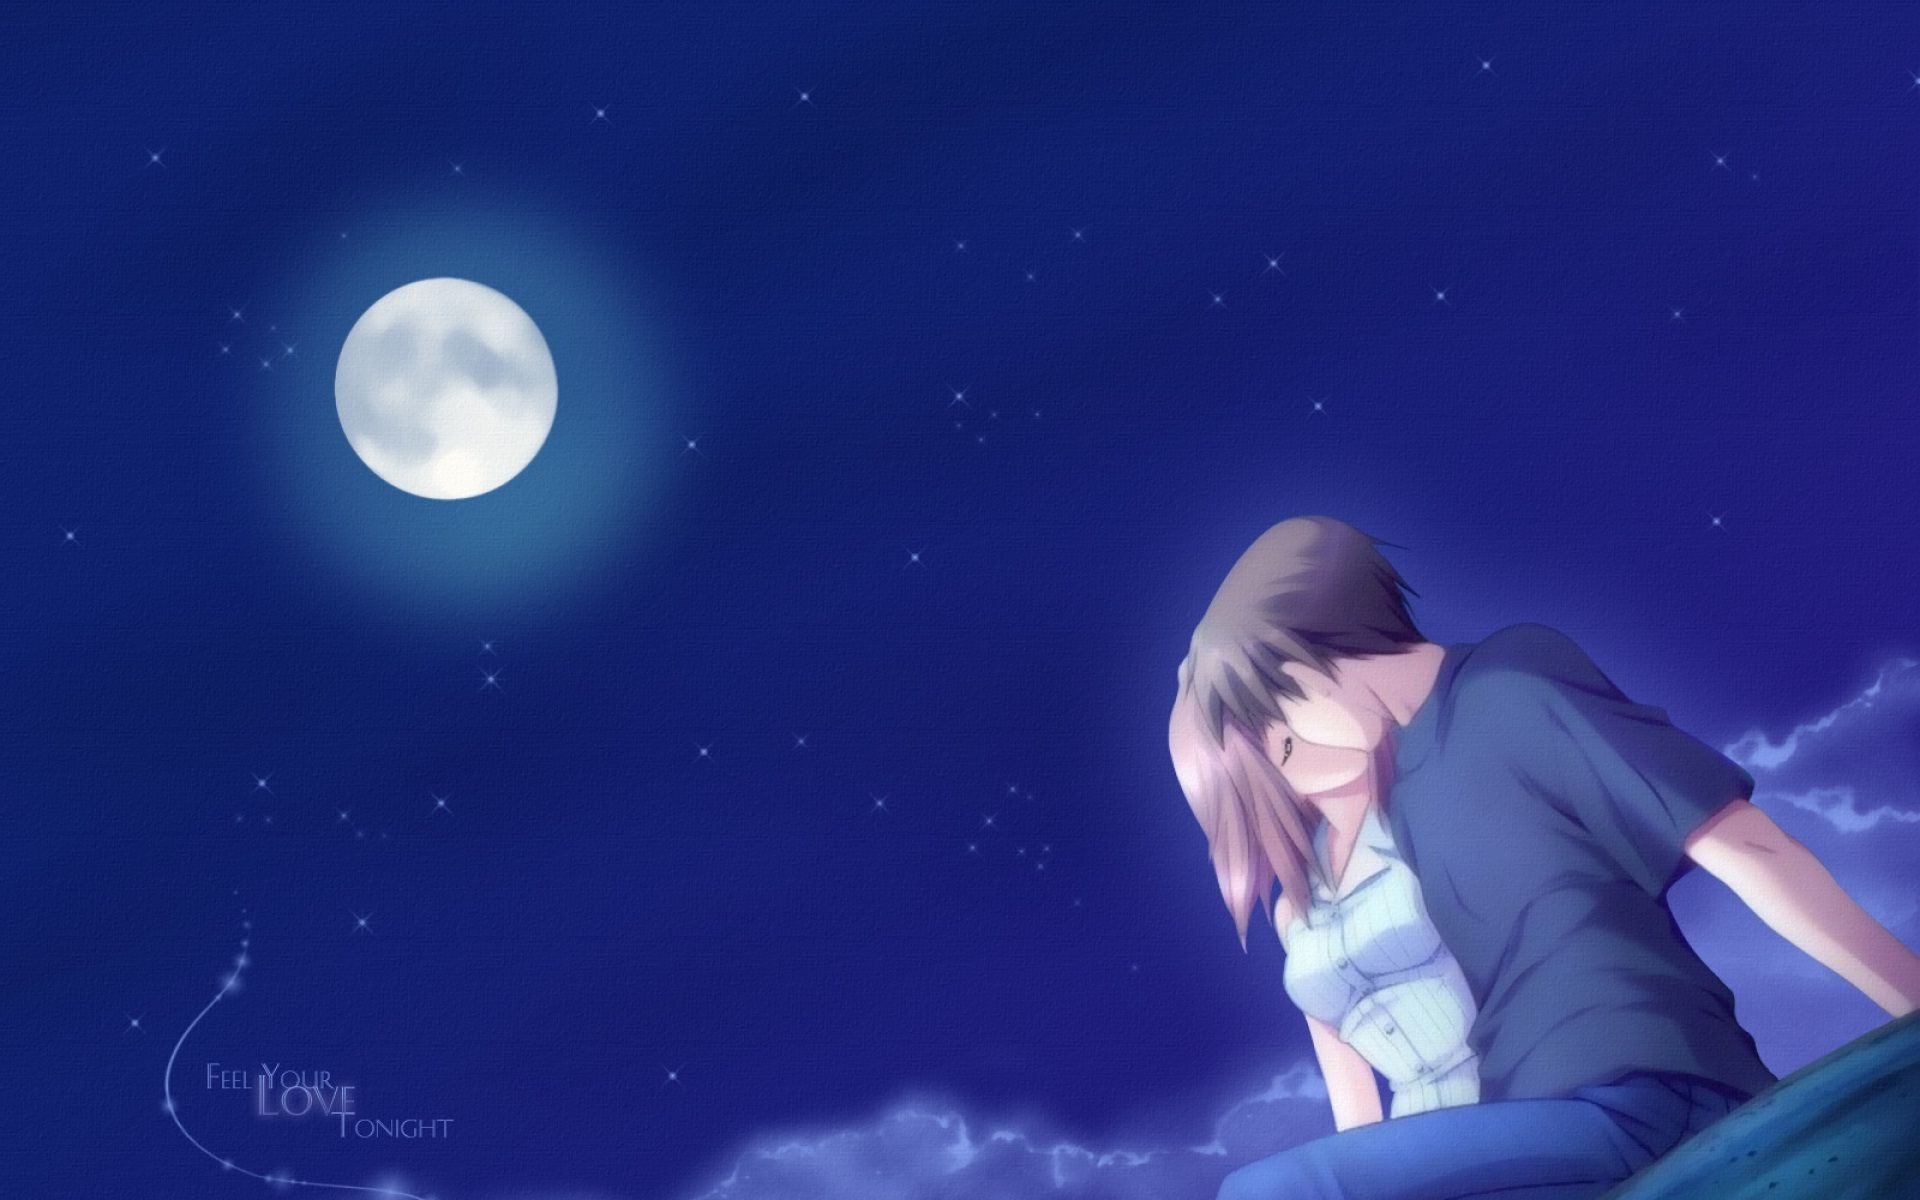 Lovely Good Night Romantic Couple Kisses Anime Love Hd Anime Wallpapers Anime Wallpaper